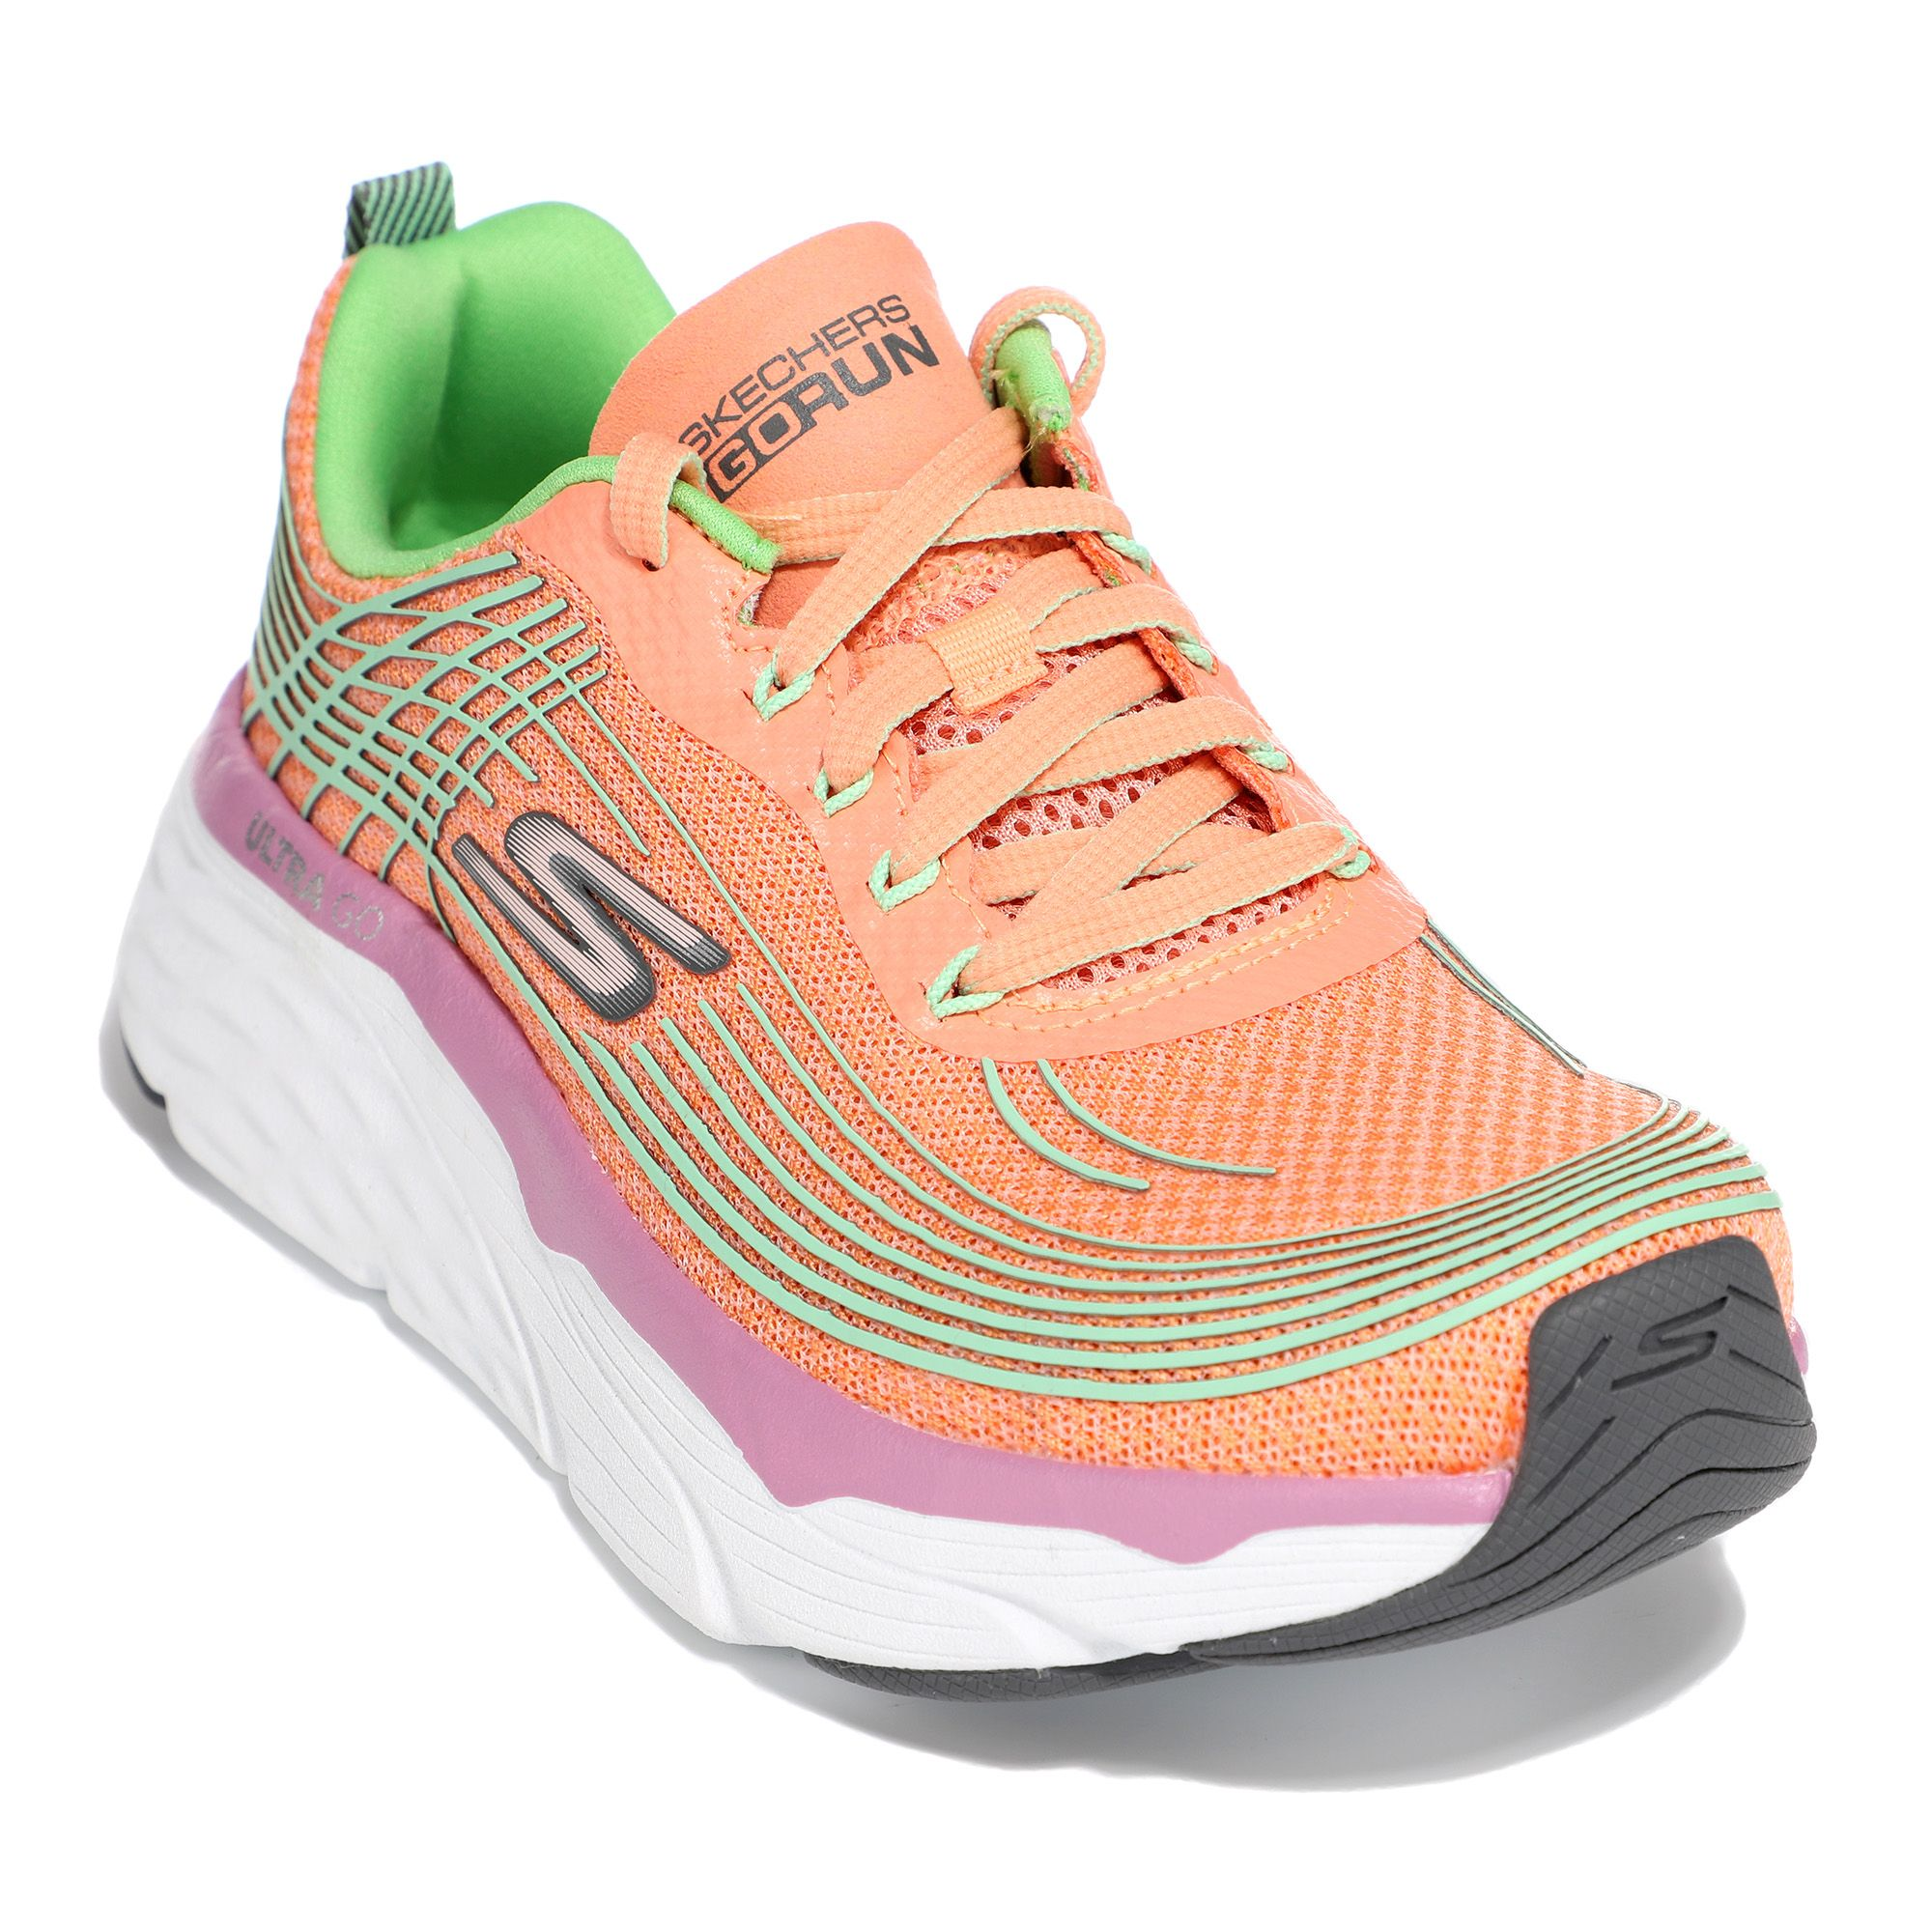 Qvc Skechers Schuhe